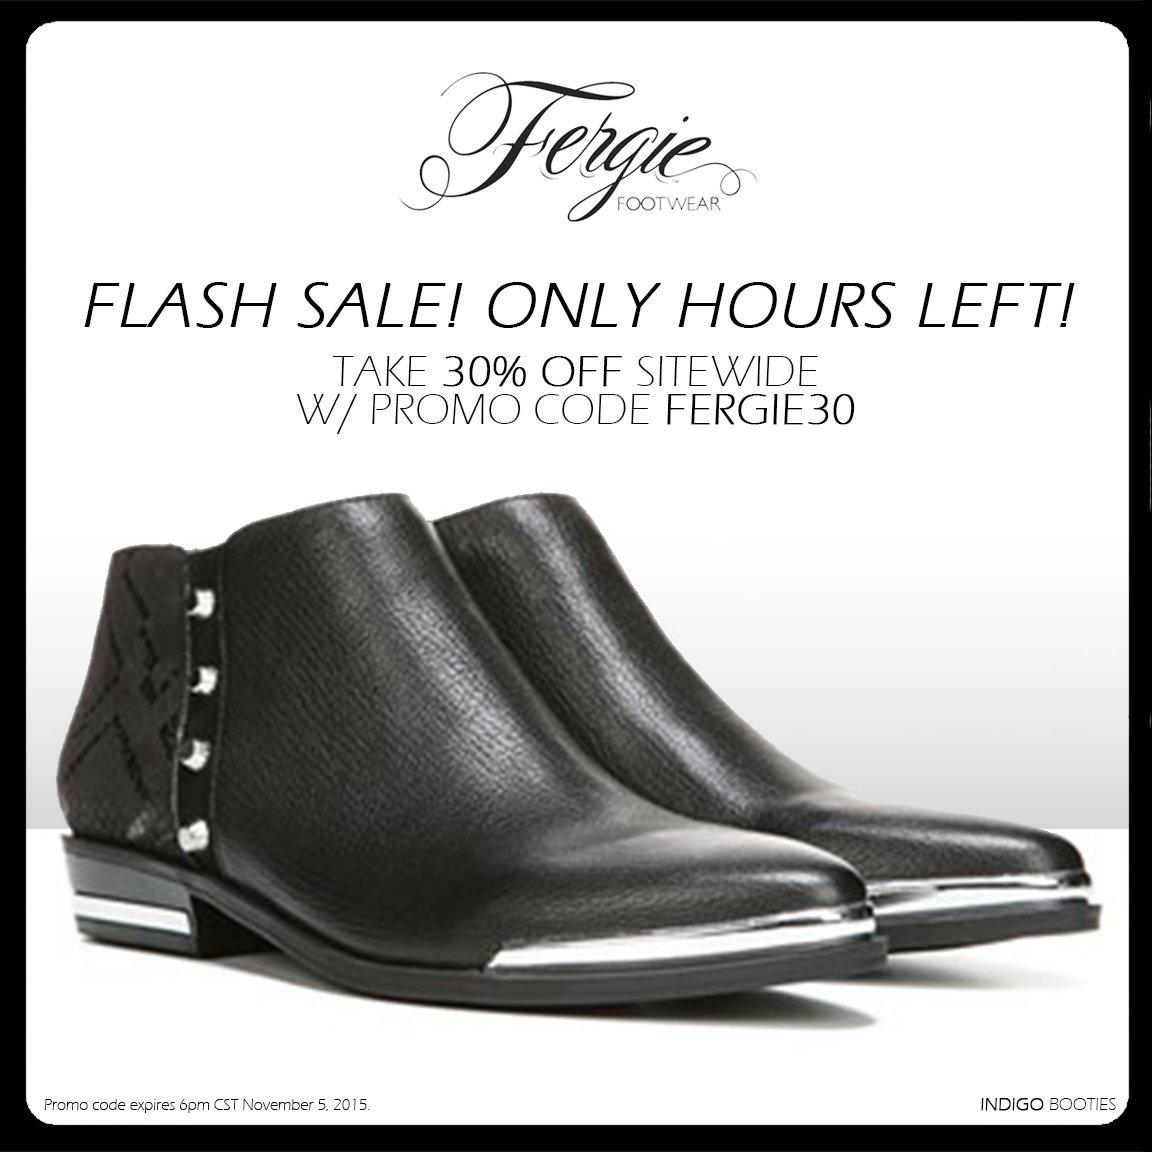 RT @FergieFootwear: #FlashSale til 6pm CT! Save 30% on @Fergie #shoes sitewide w/ #promocode FERGIE30. #shoesale https://t.co/h8LzbqcArR ht…